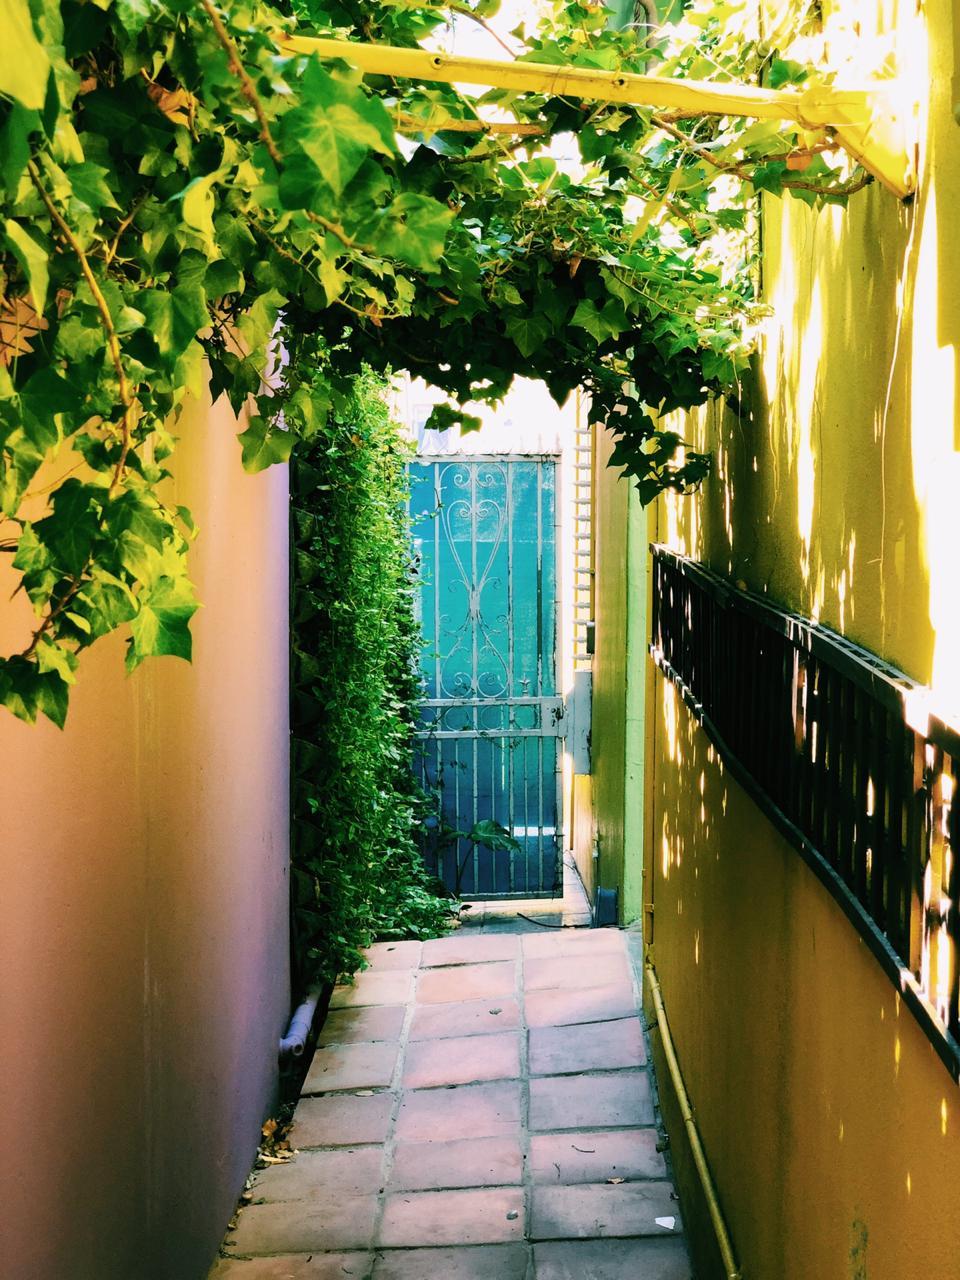 littlecorridor.JPG